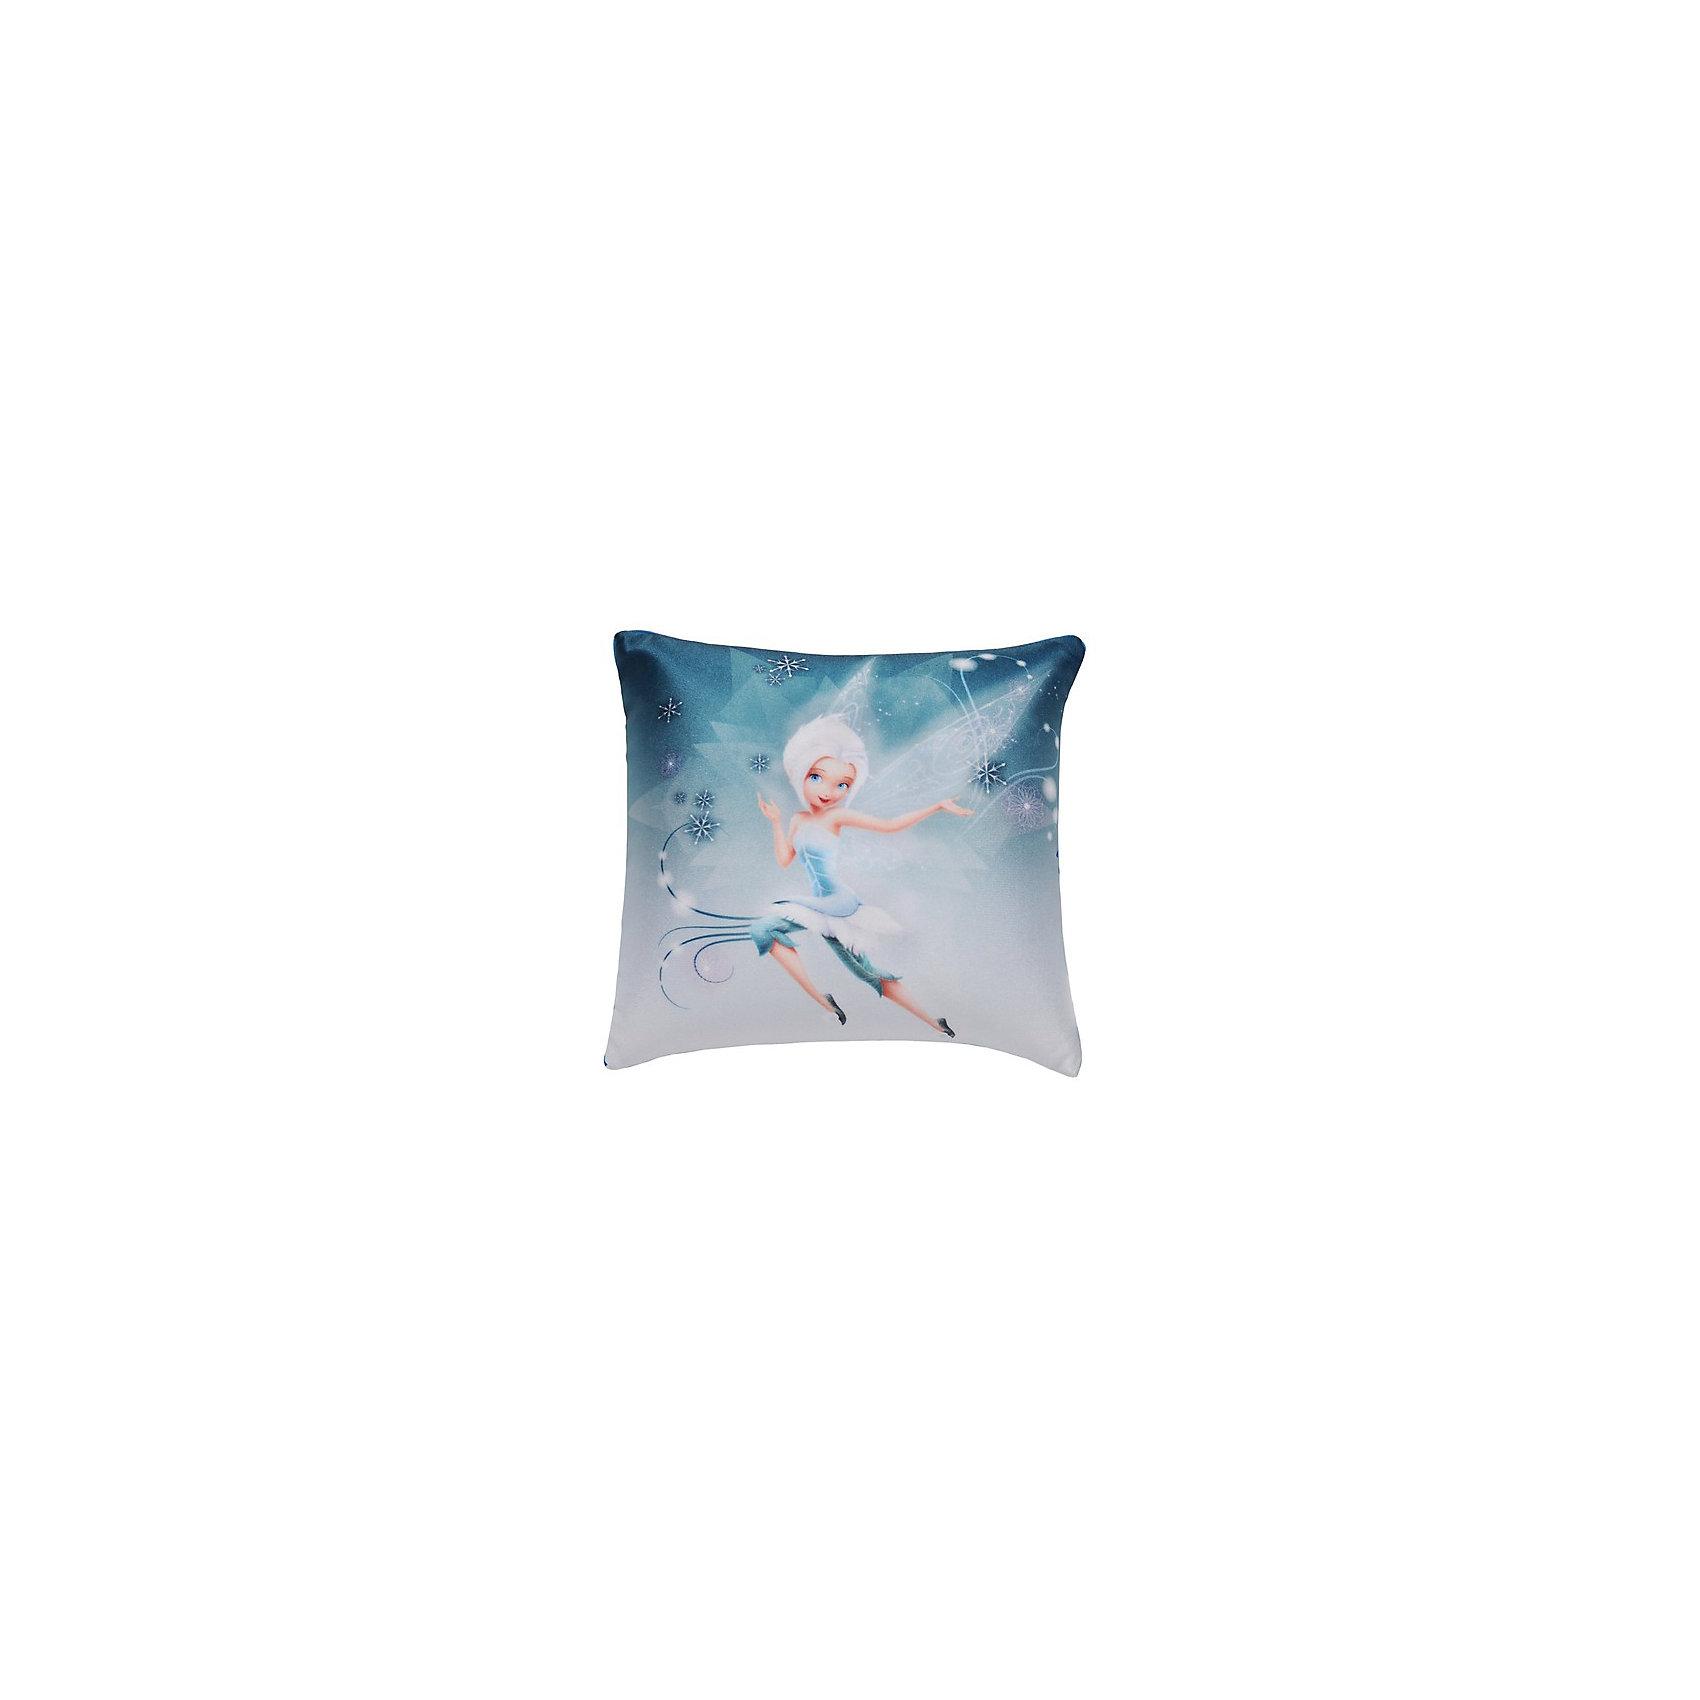 Подушка Феи 20*20, арт. 52703, Small Toys, голубой